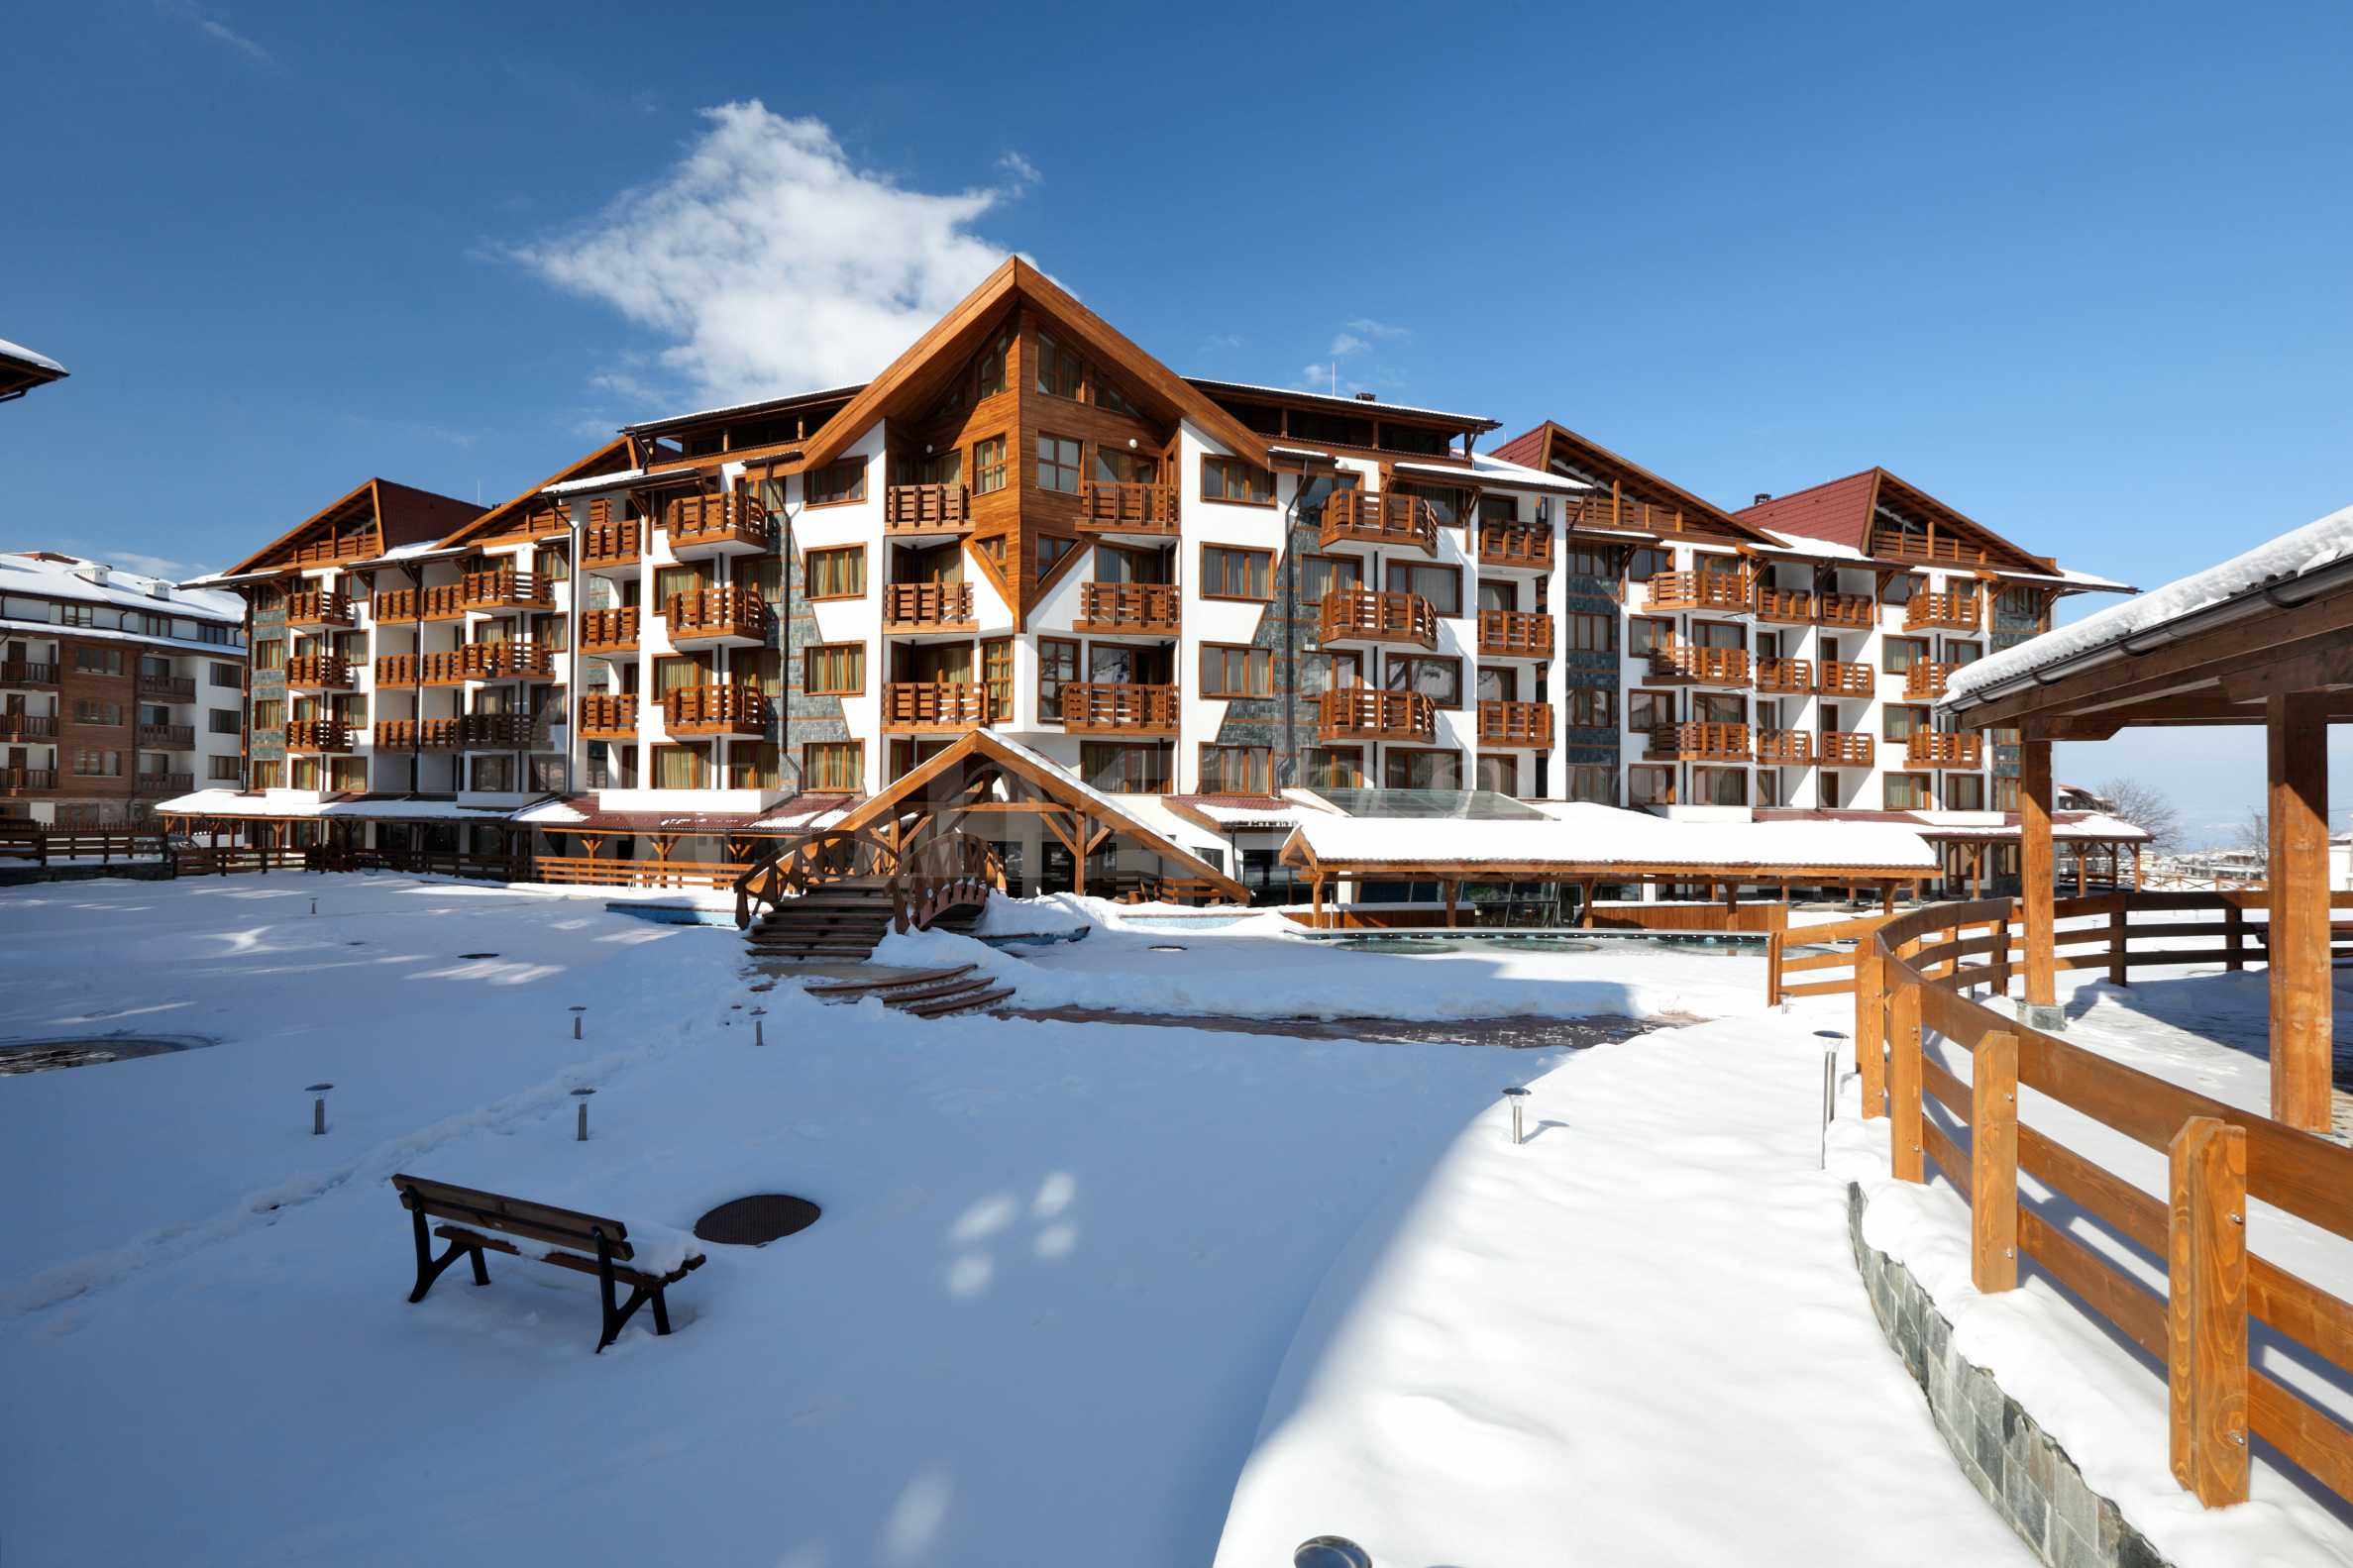 Gated residential complex near the Gondola lift of Bansko ski resort1 - Stonehard